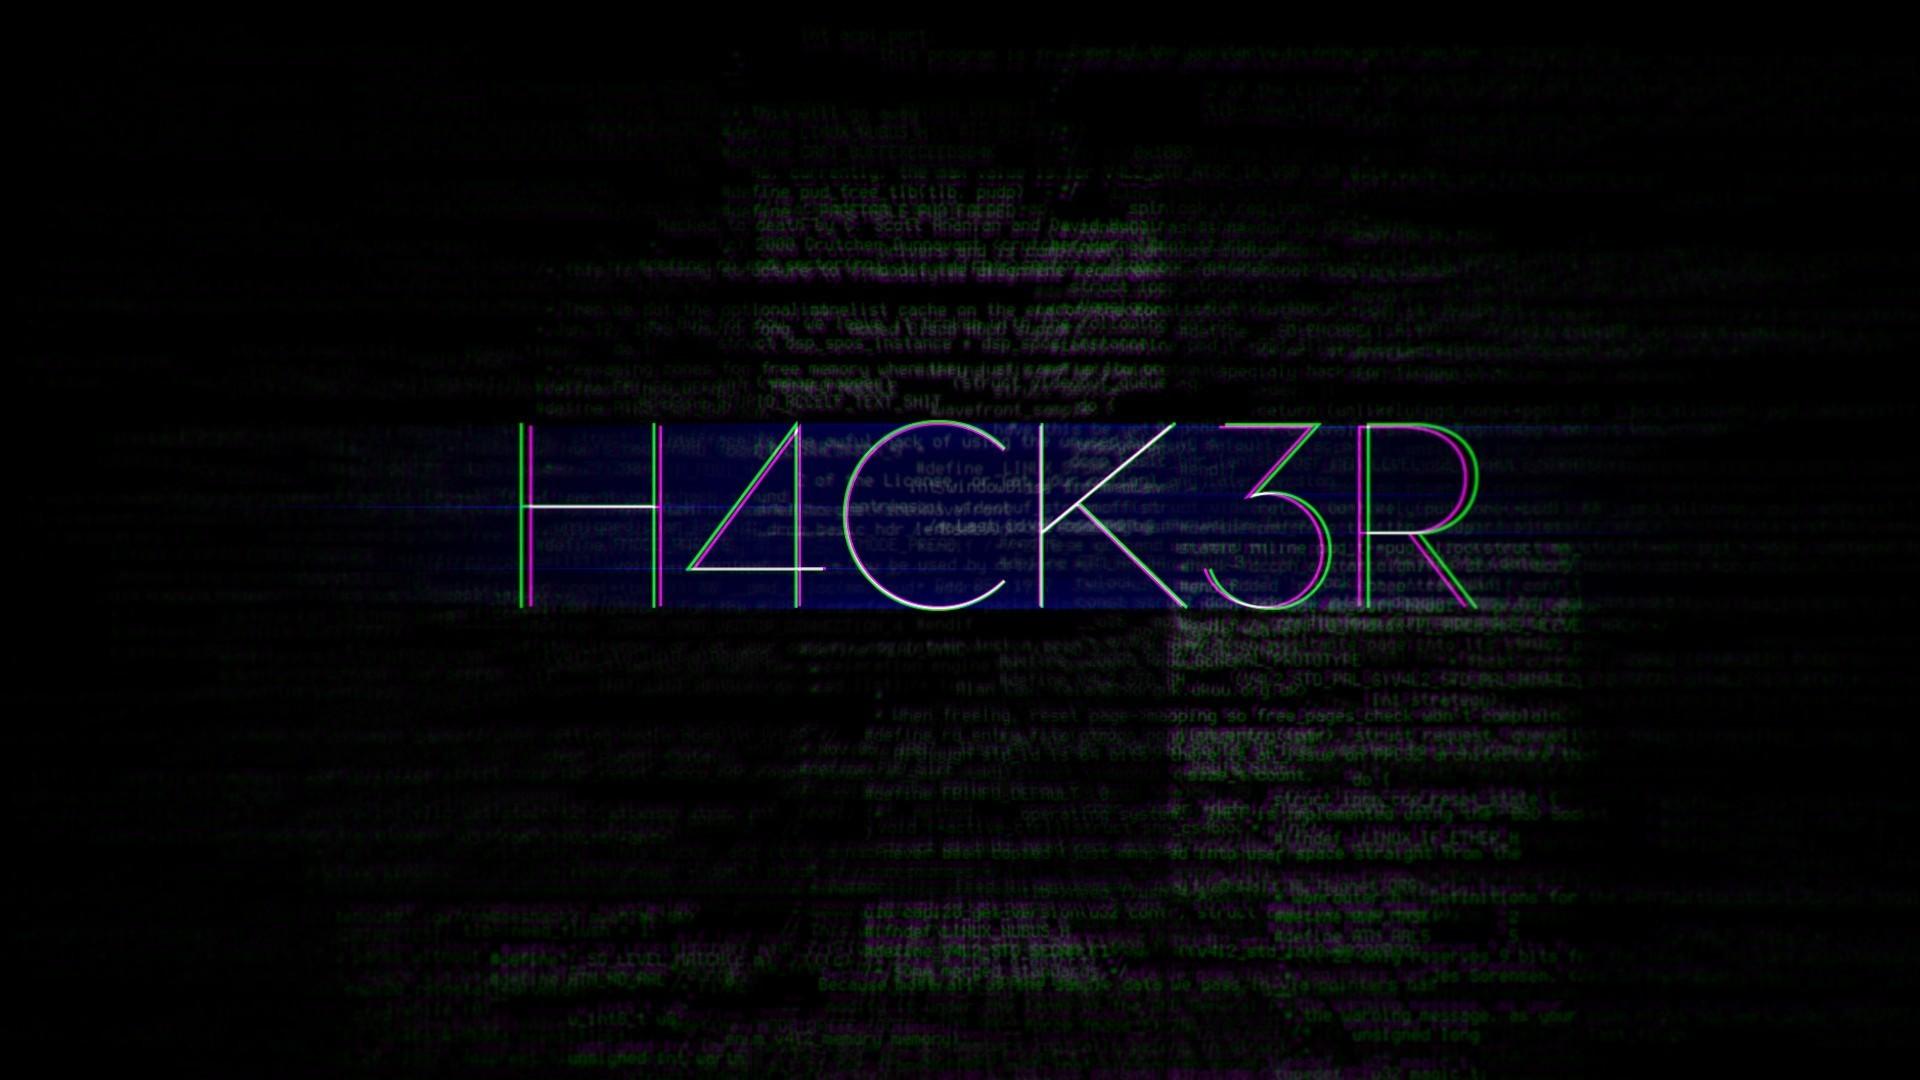 … Kali Linux 1.0.3 hacker-wallpaper H4CK3R …